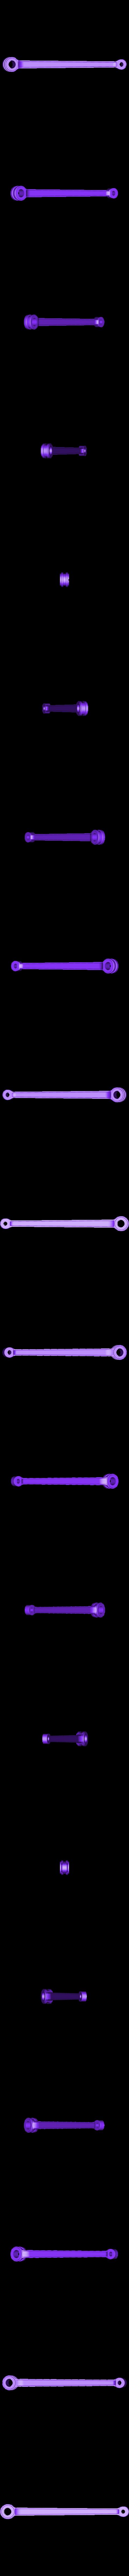 Main_Rod.STL Download free STL file 4-8-8-4 Big Boy Locomotive • 3D printer object, RaymondDeLuca